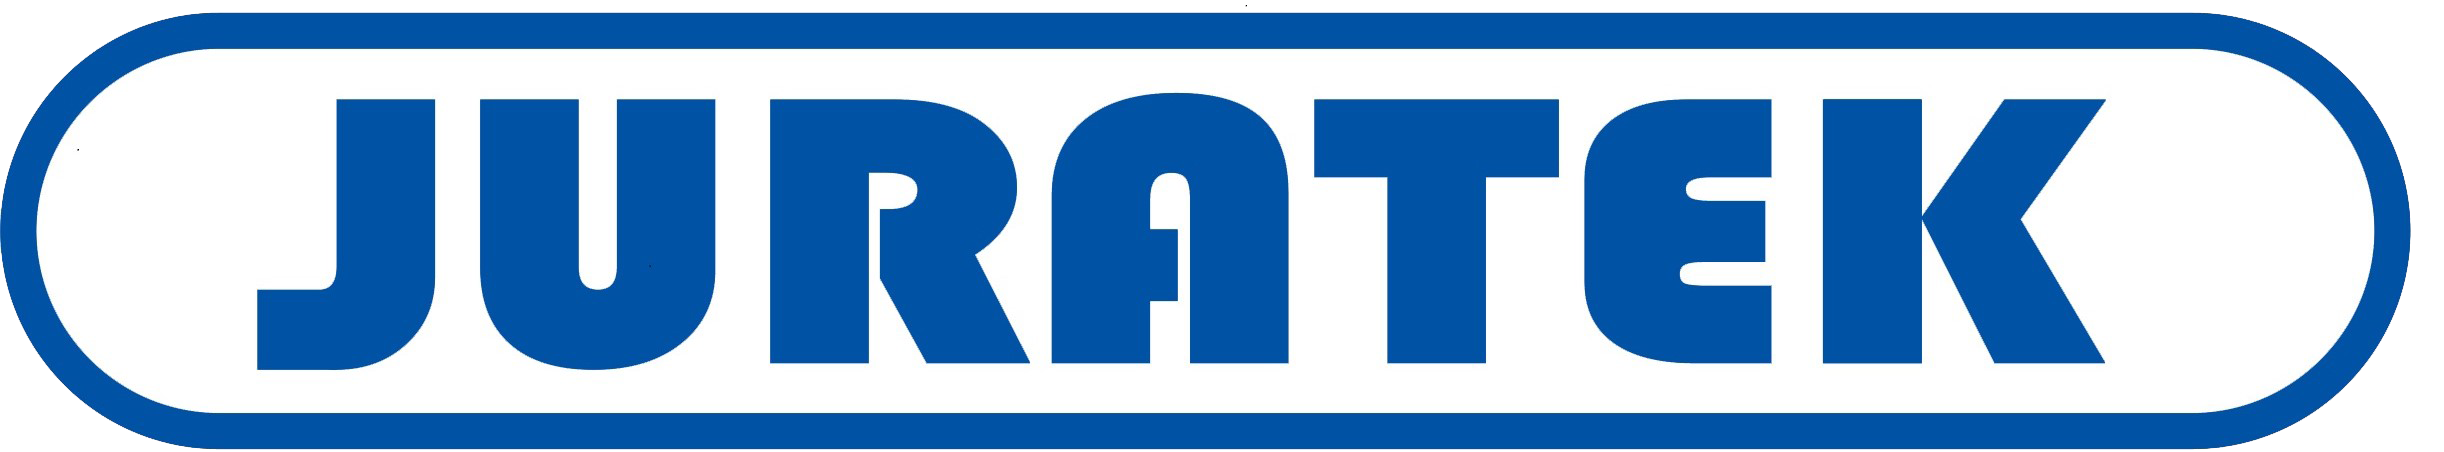 Juratec Brakes